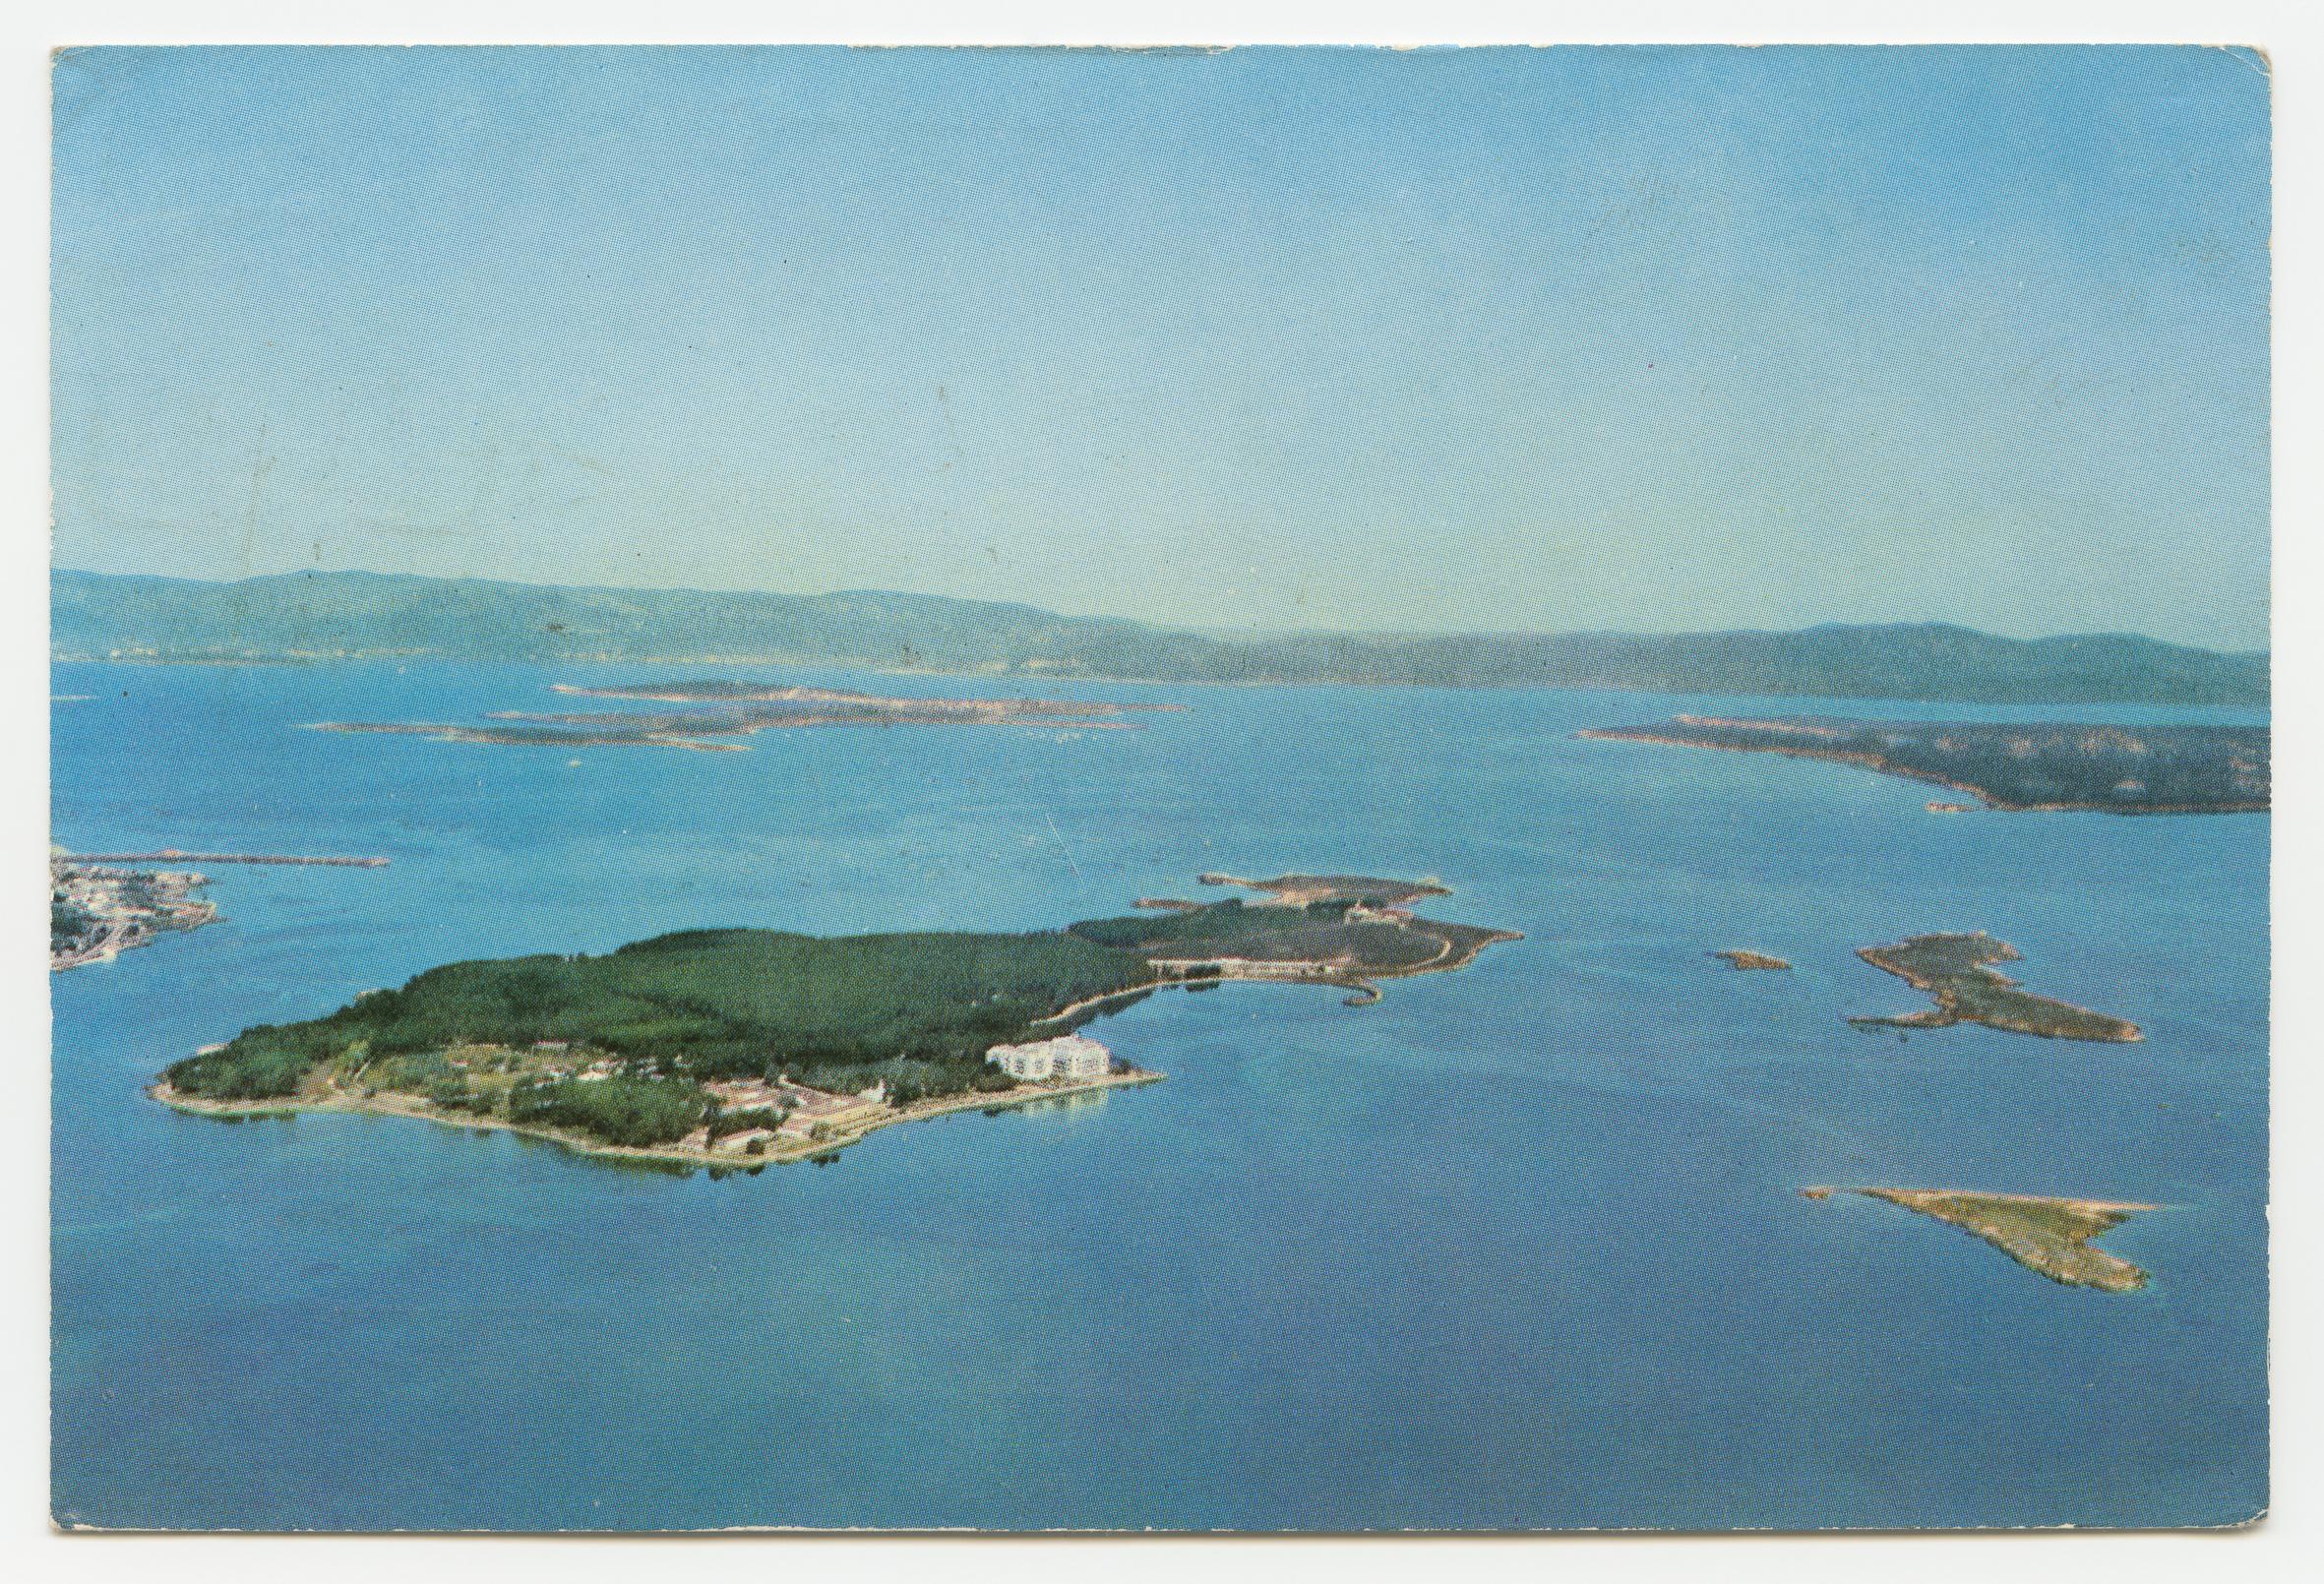 isla-postal-01.jpg